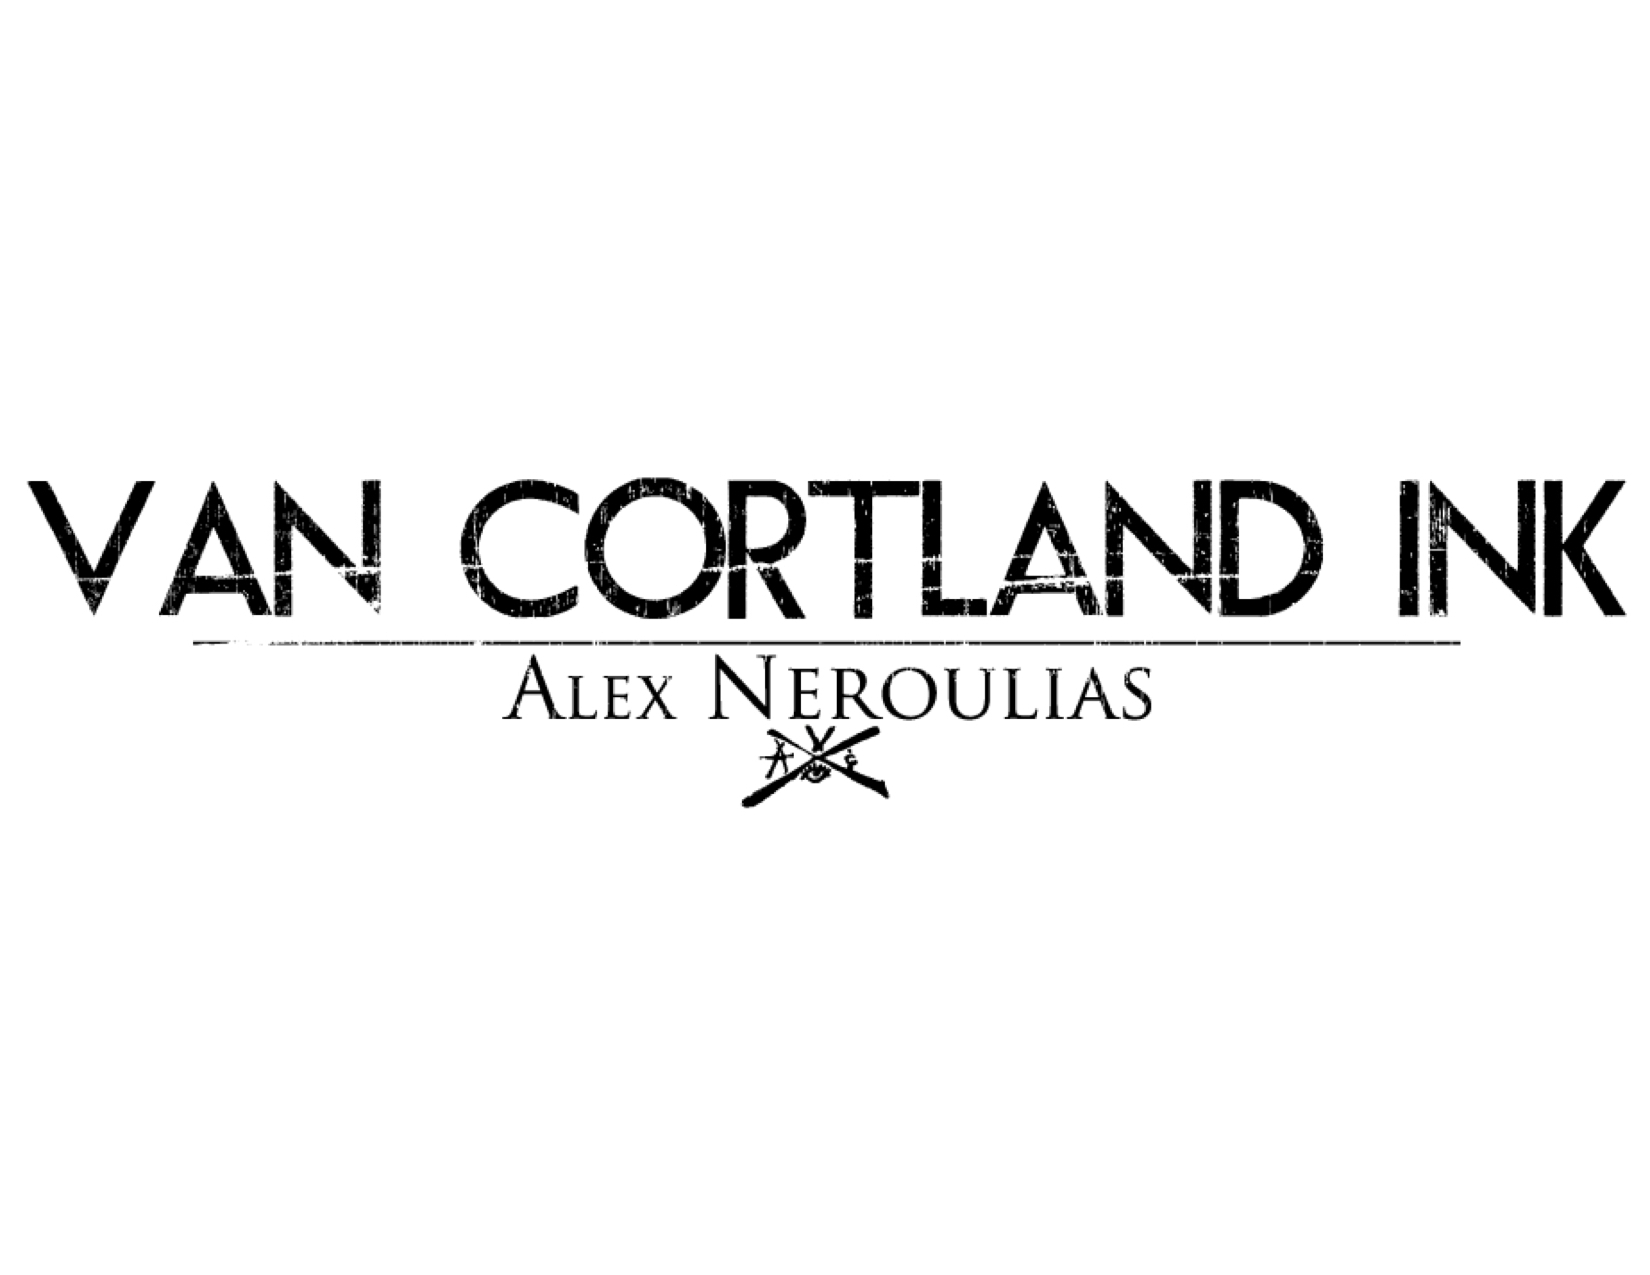 vancortland logo.jpg